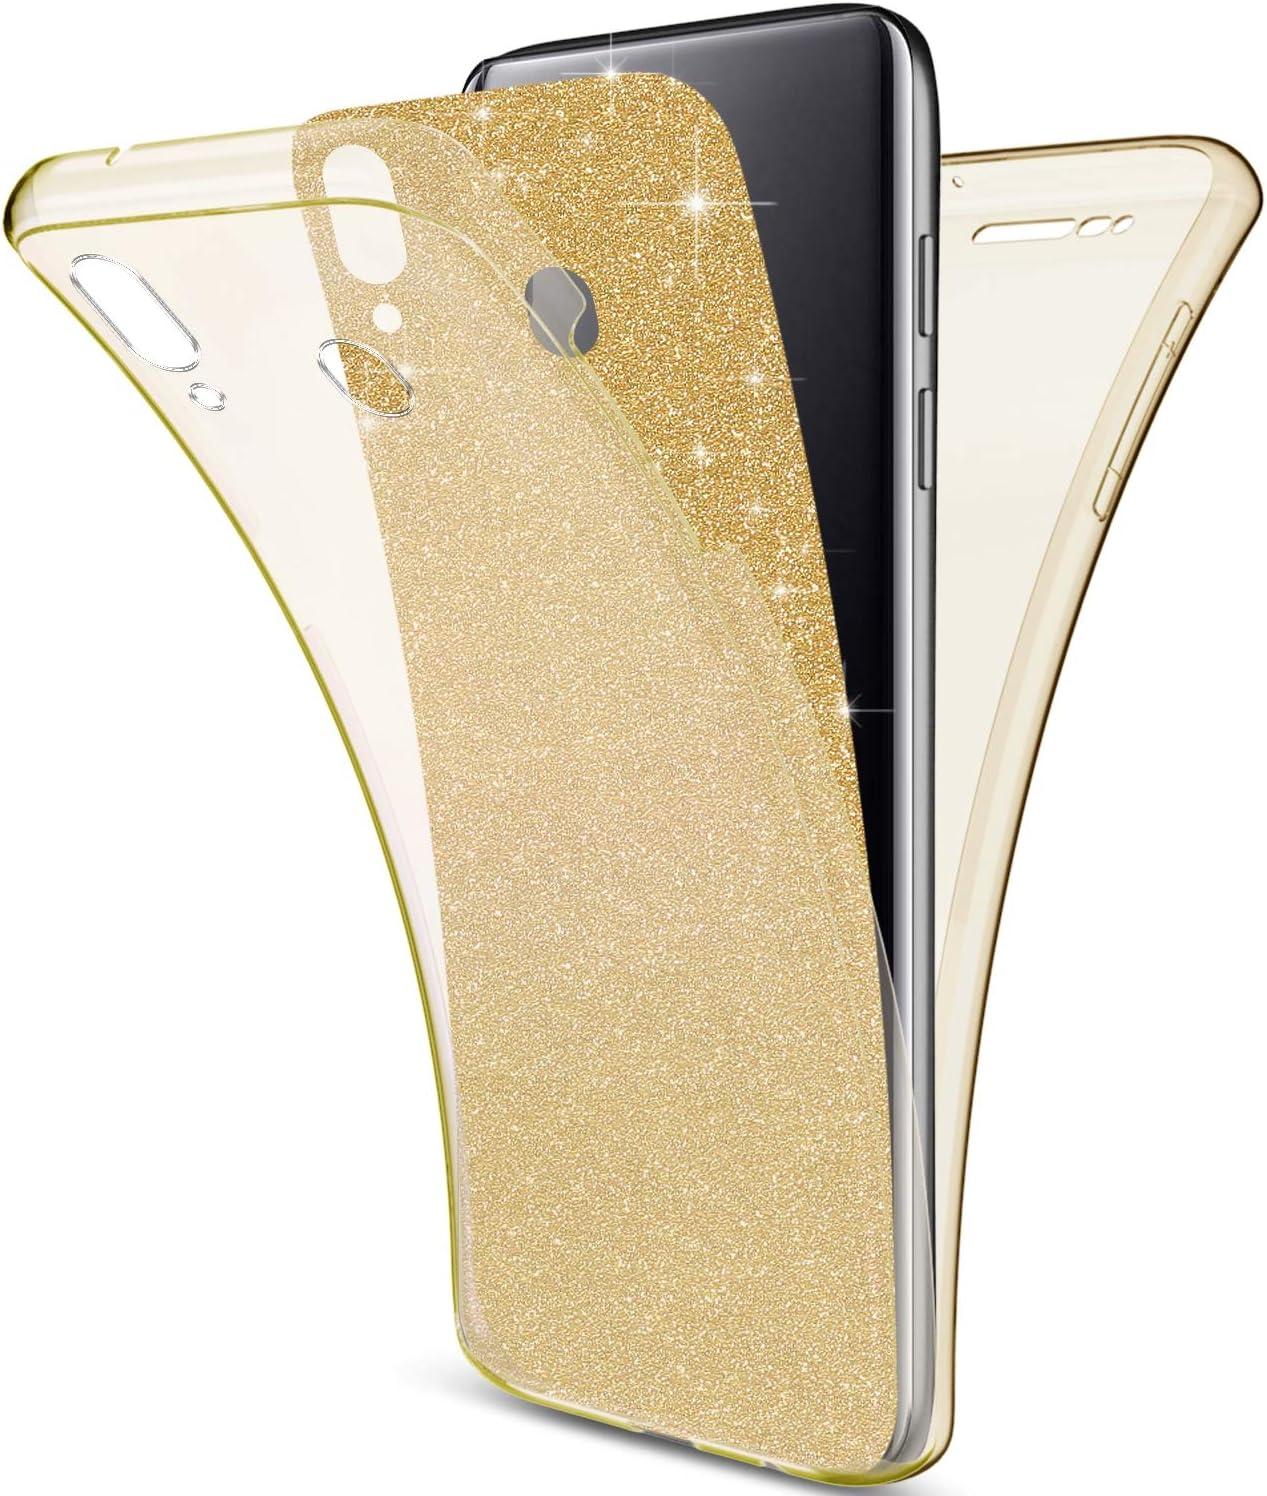 Uposao Kompatibel mit Samsung Galaxy M20 H/ülle 360 Full Body Cover Bling Gl/änzend Glitter H/ülle Rundum Handyh/ülle Doppel-Schutz H/ülle Vorne Hinten Silikon Transparent Schutzh/ülle,Gold